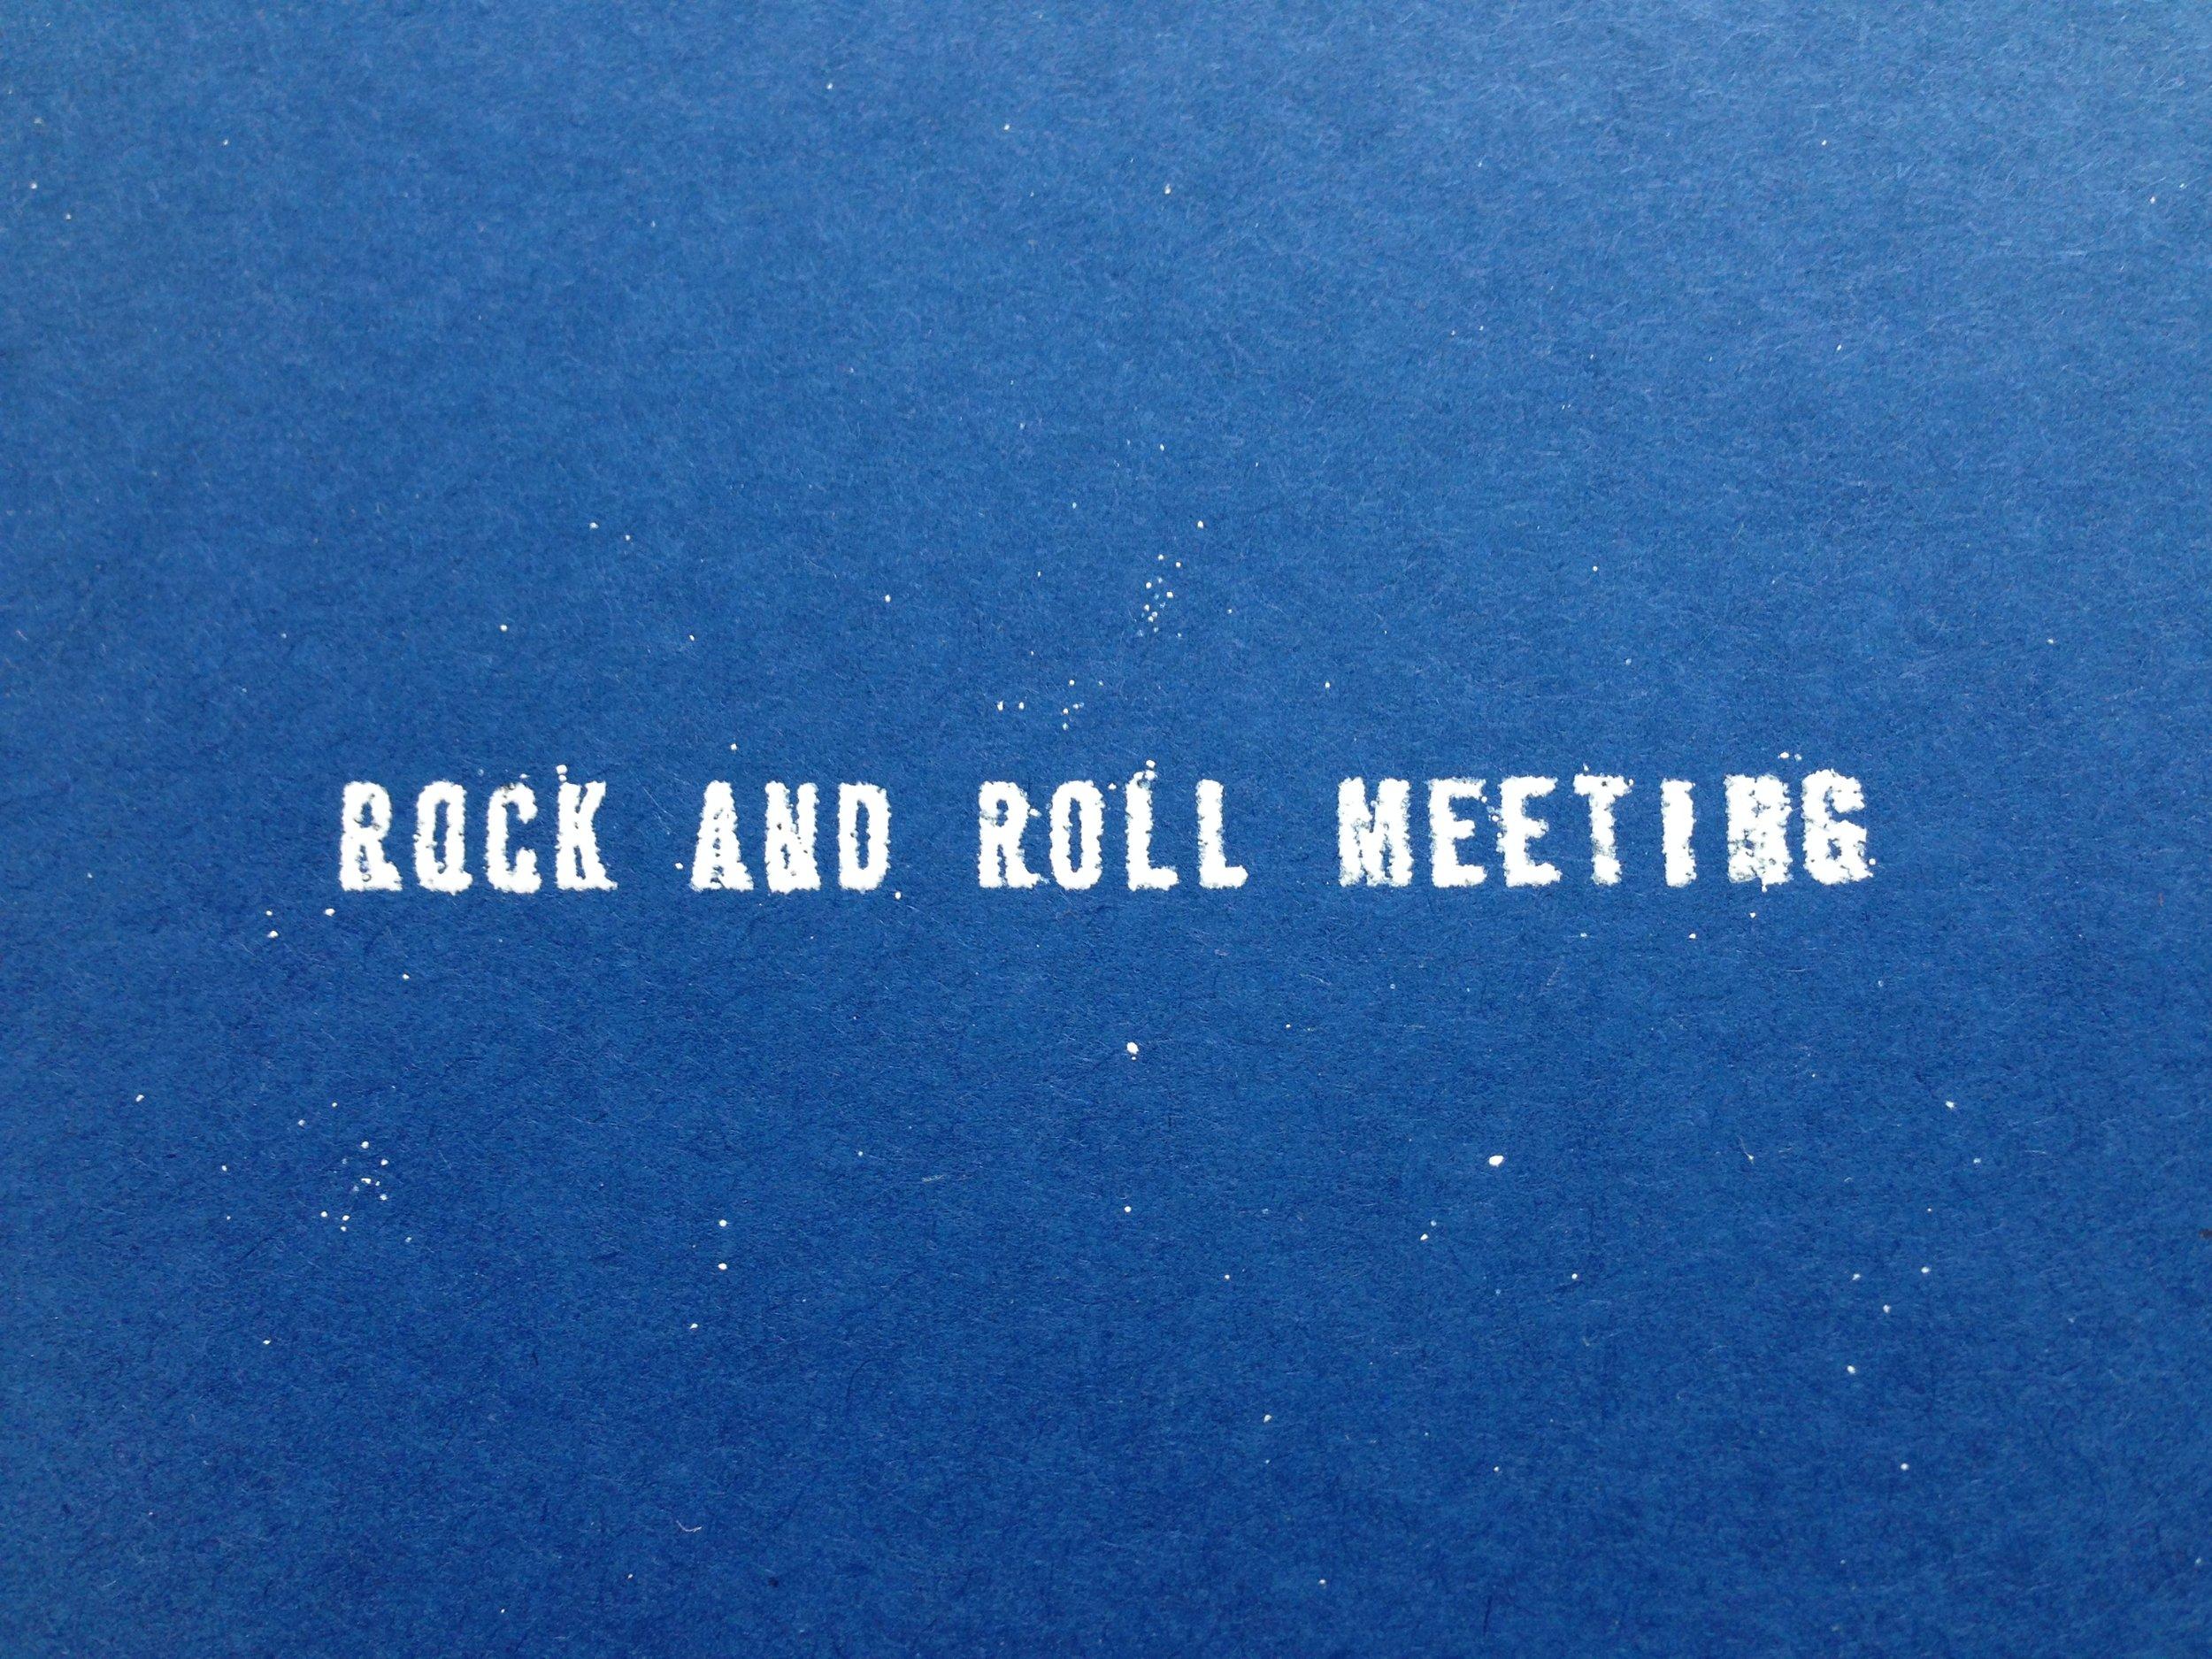 R-R_Meeting.jpg